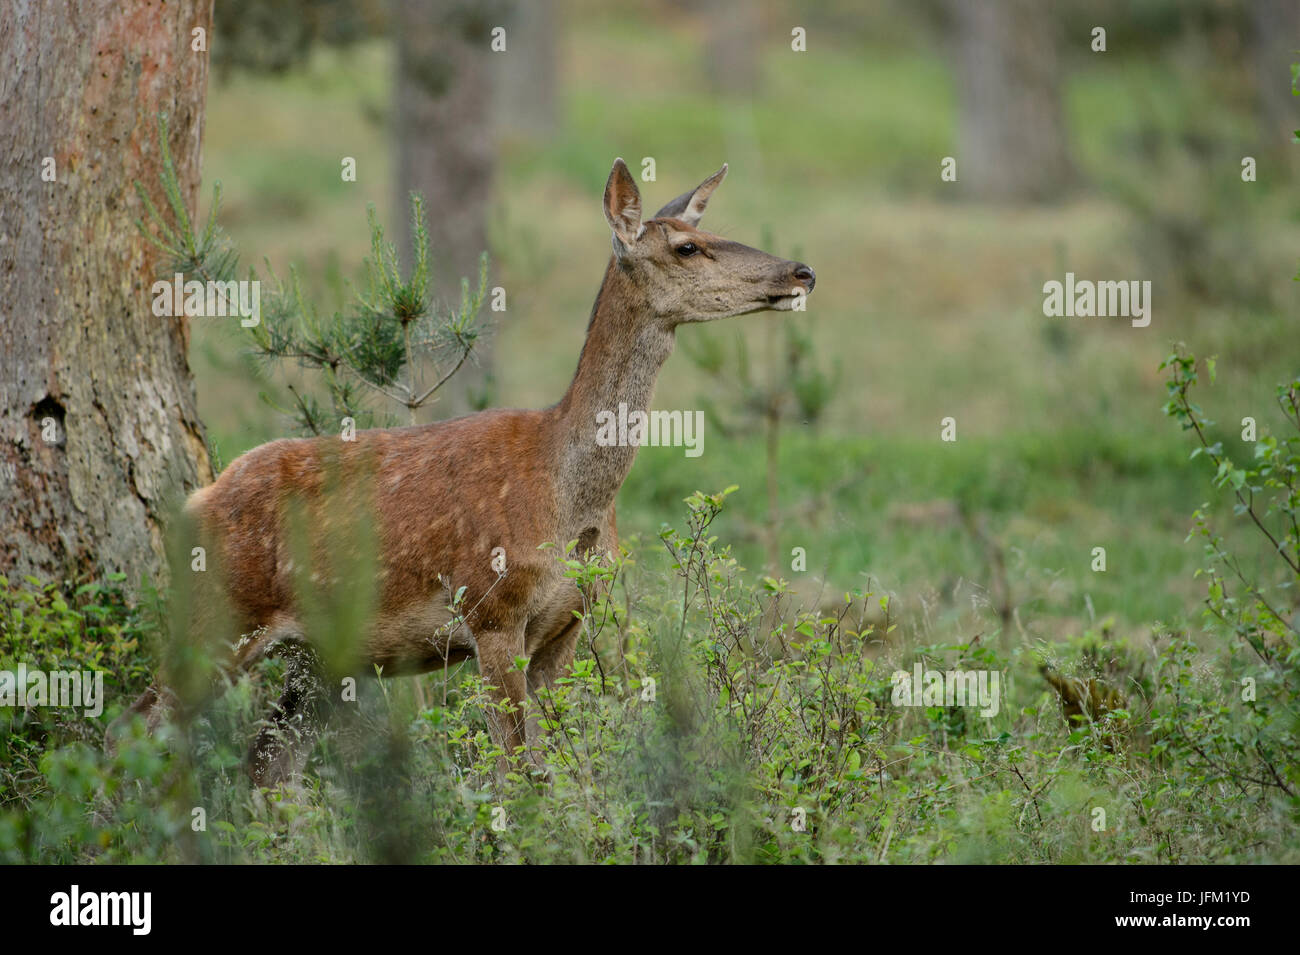 Red Deer hind maleodoranti nell'aria. Hoge Veluwe National Park, Paesi Bassi Immagini Stock